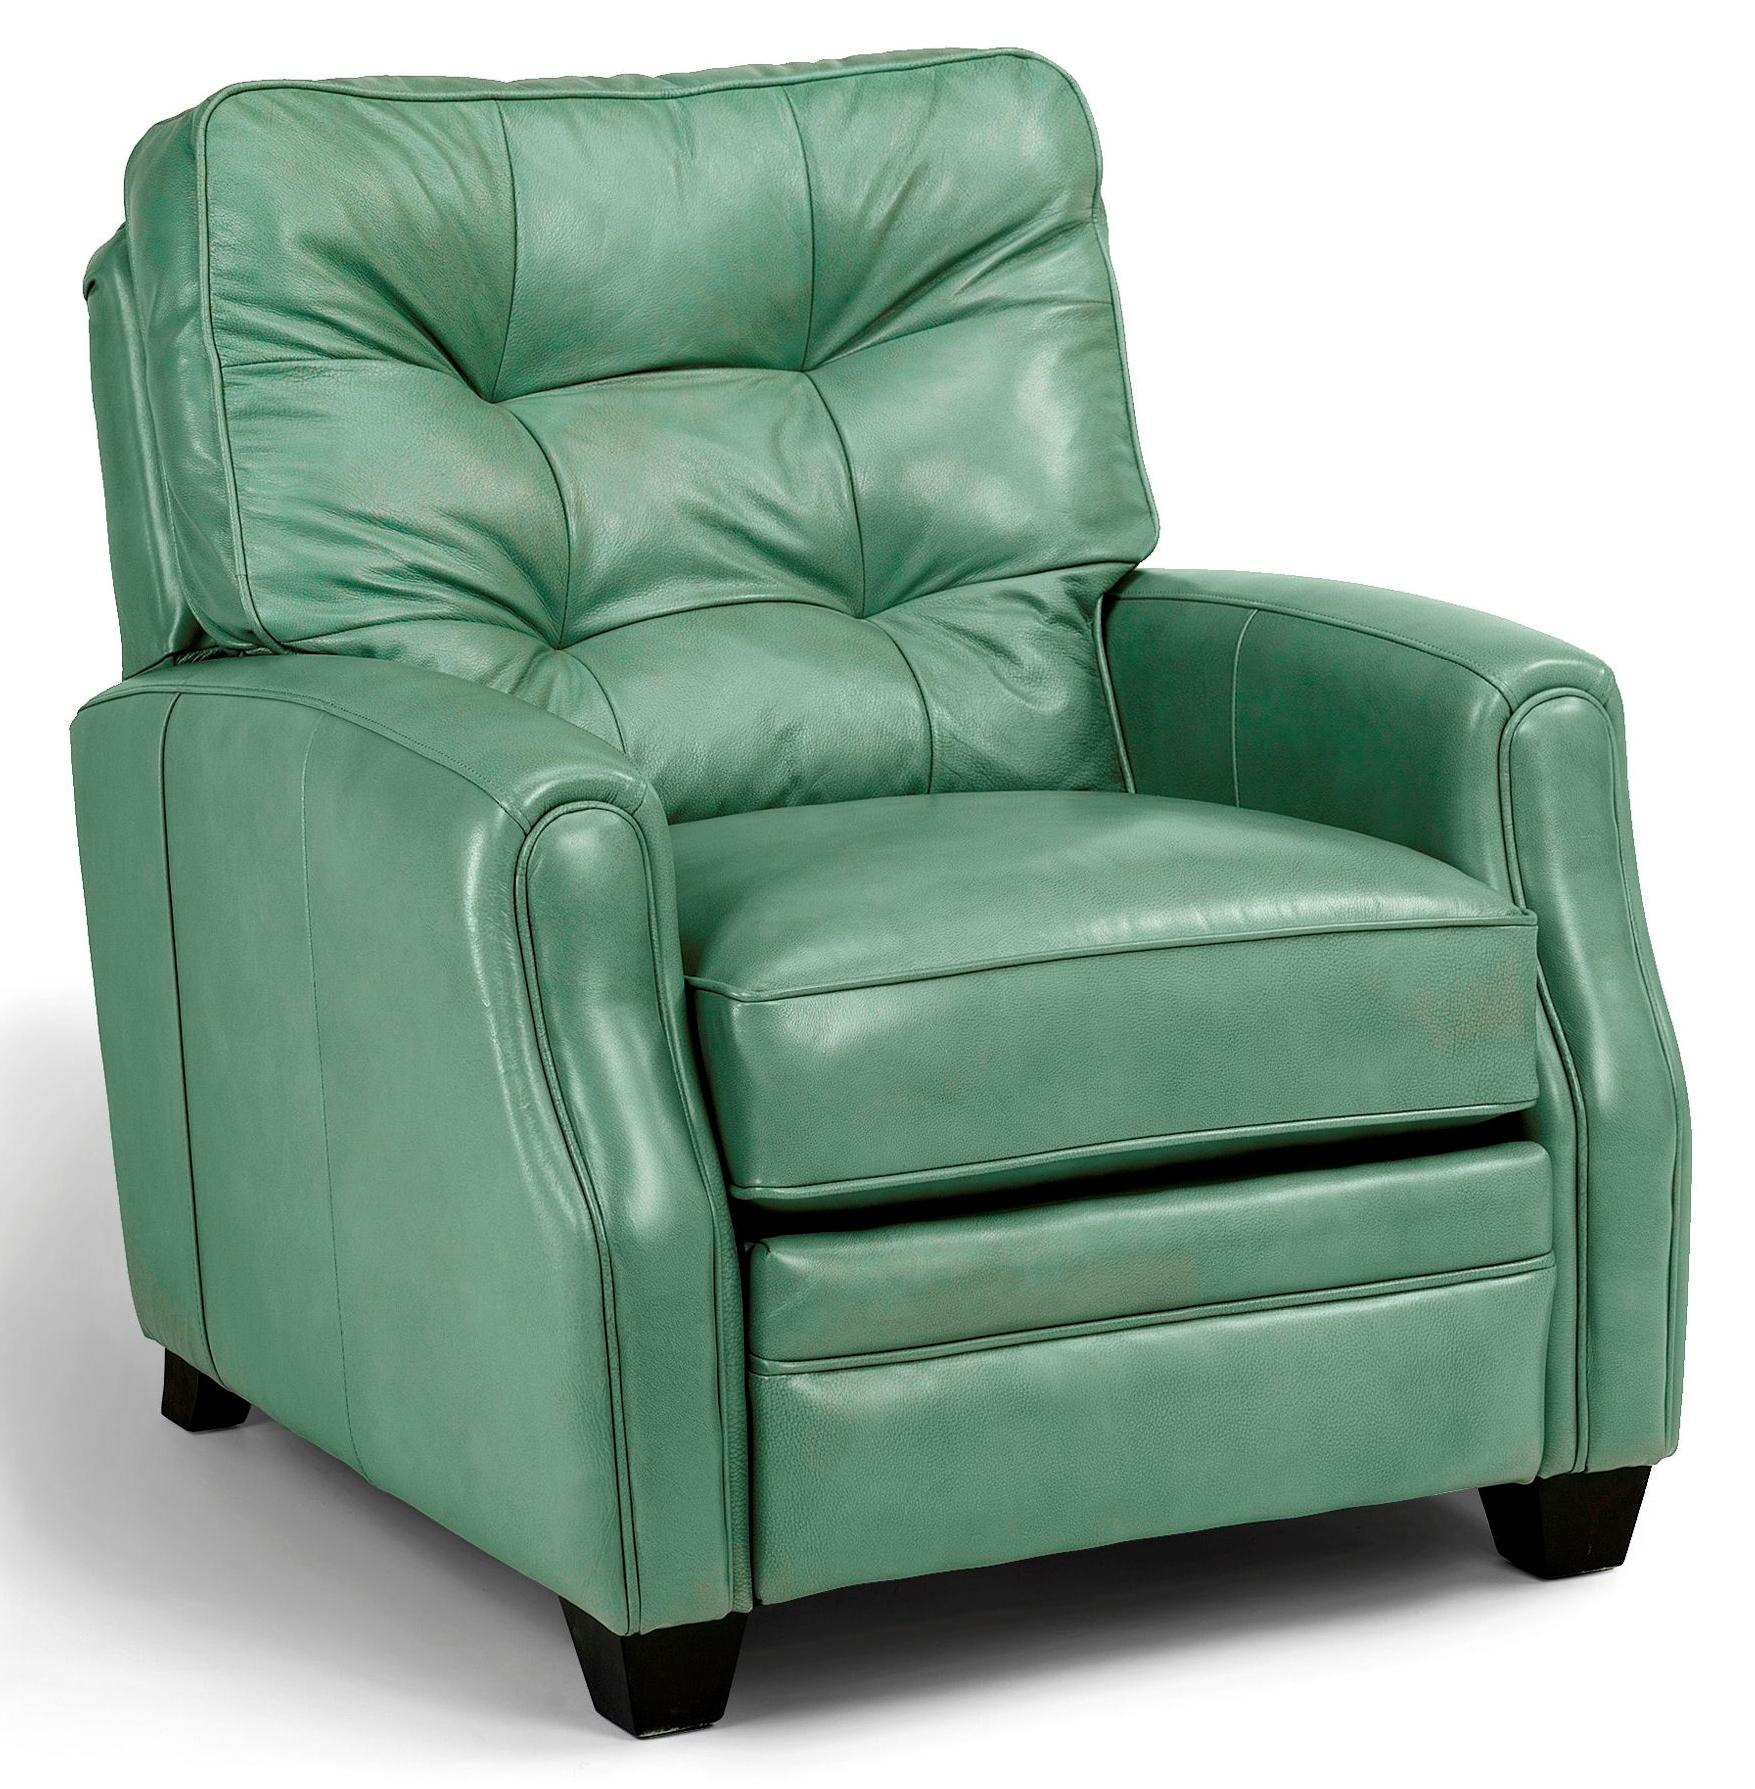 jasen fine recliners flexsteel recliner furniture s since westside